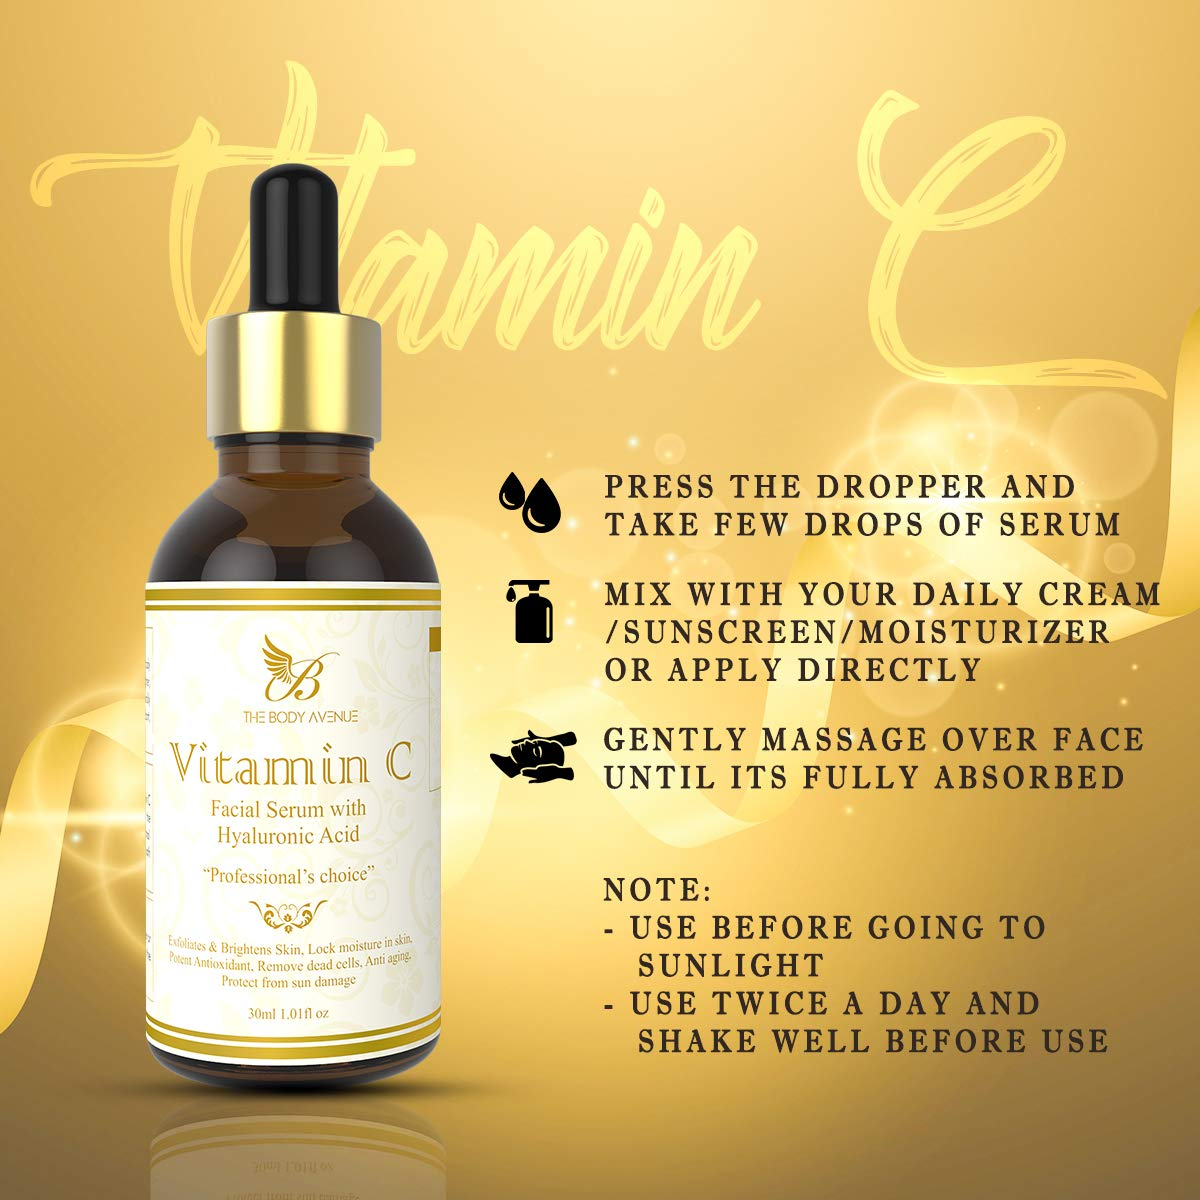 Body Avenue Vitamin C Serum for face